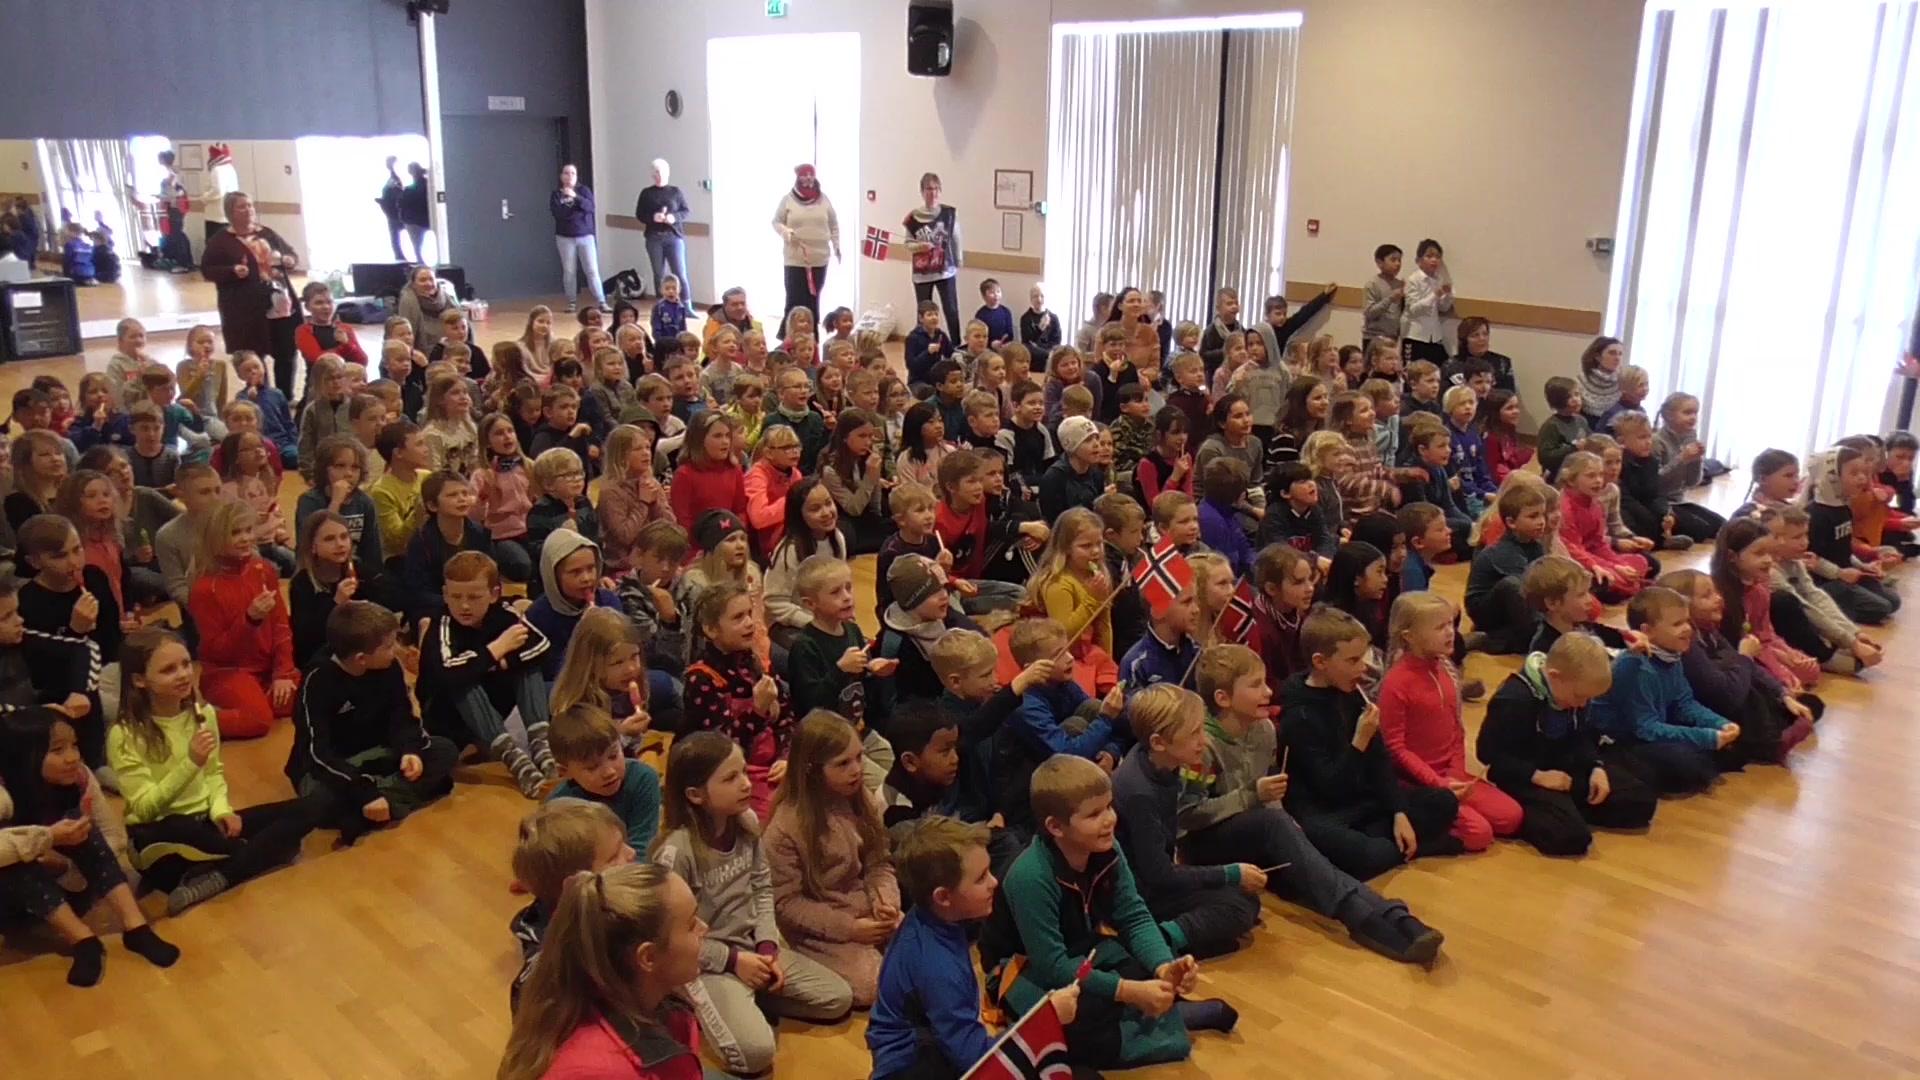 Heiarop hilsen fra Froland skole